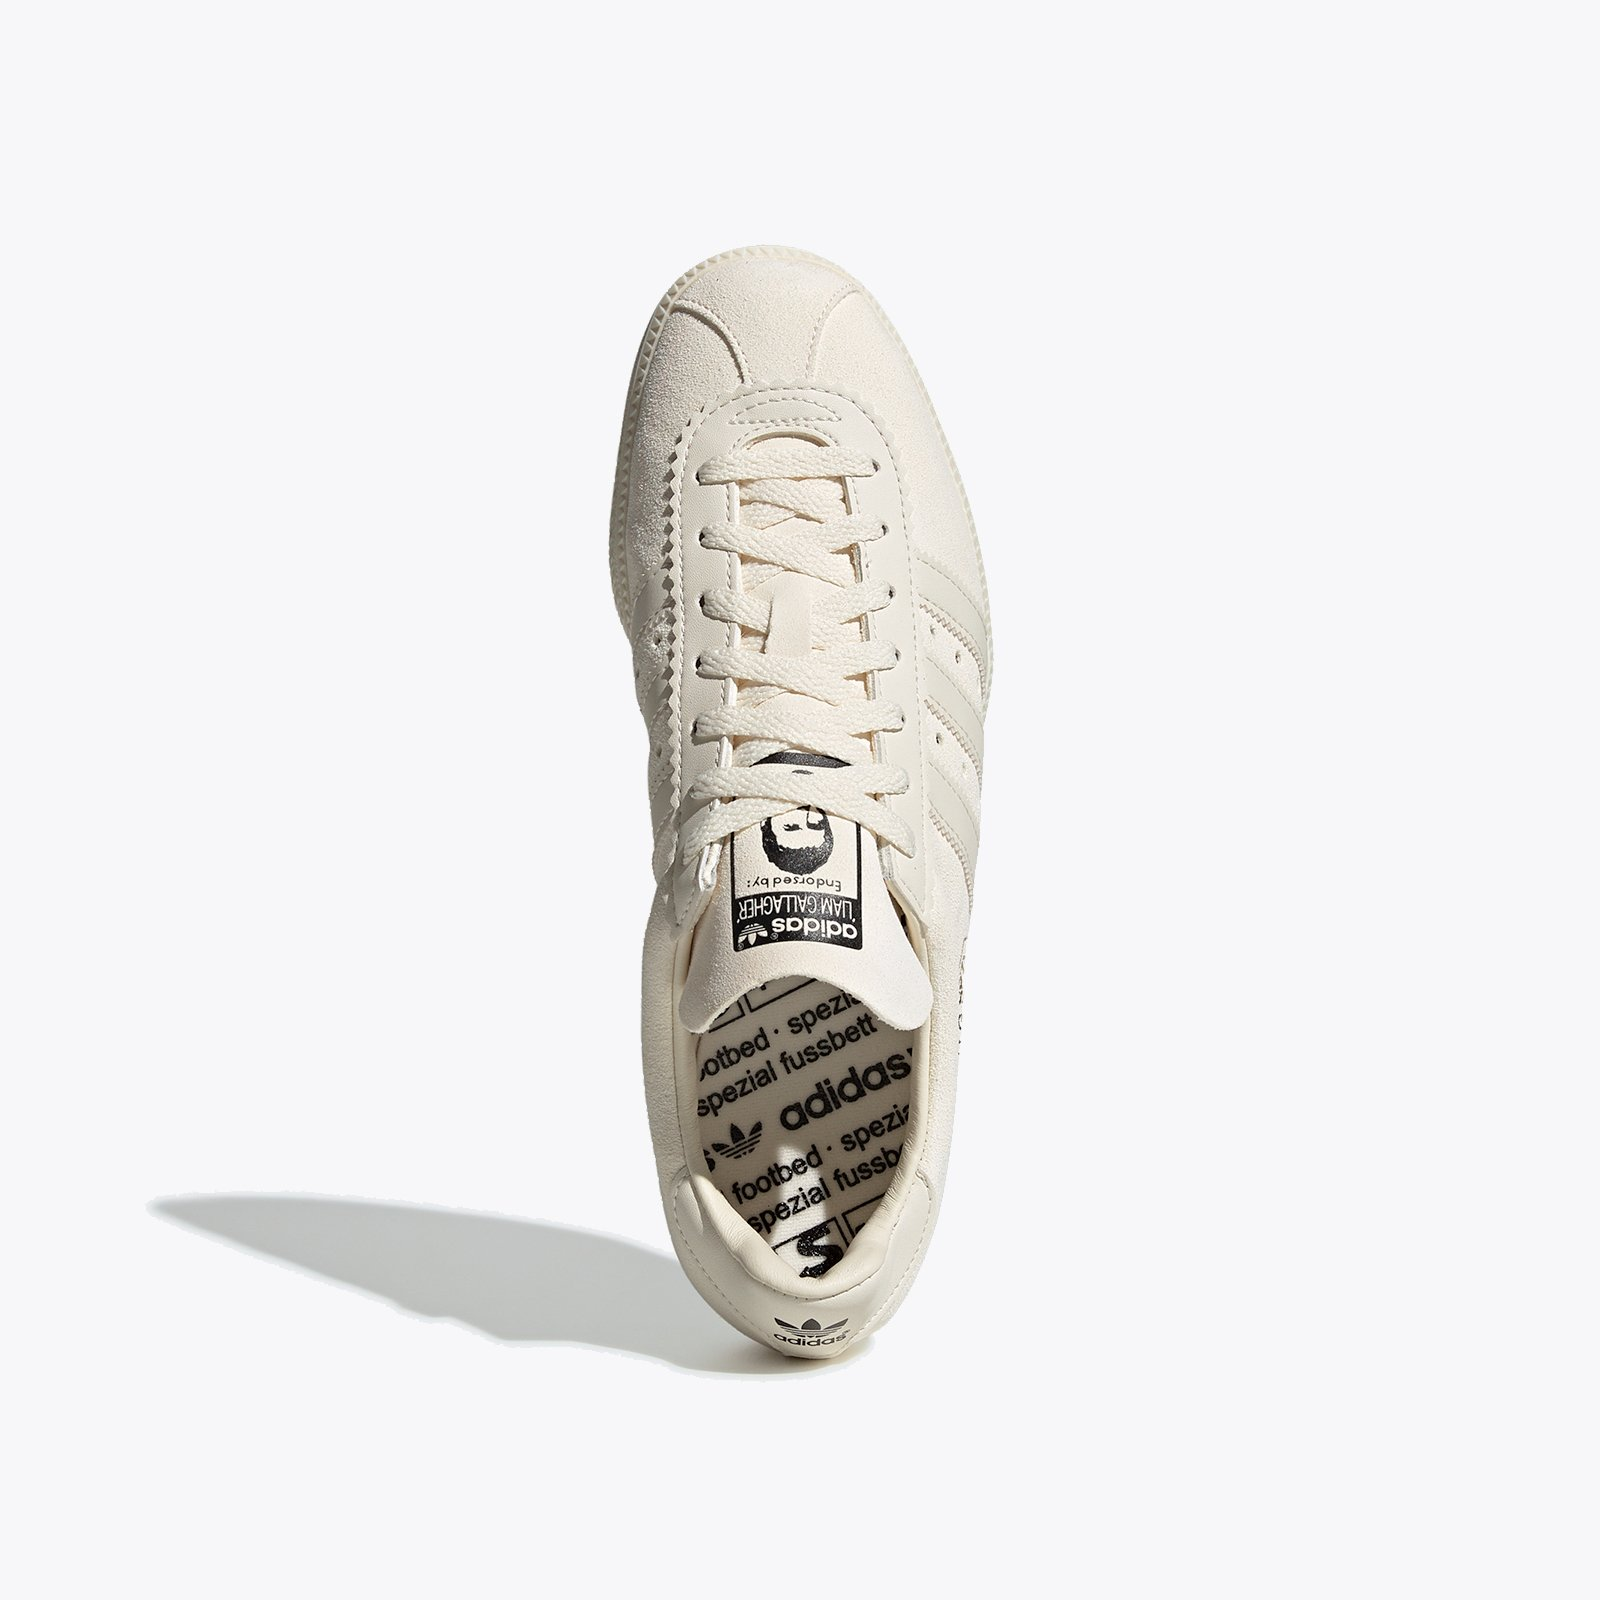 ritmo delicado solapa  adidas LG SPZL by Liam Gallagher - Ee8789 - Sneakersnstuff | sneakers &  streetwear online since 1999